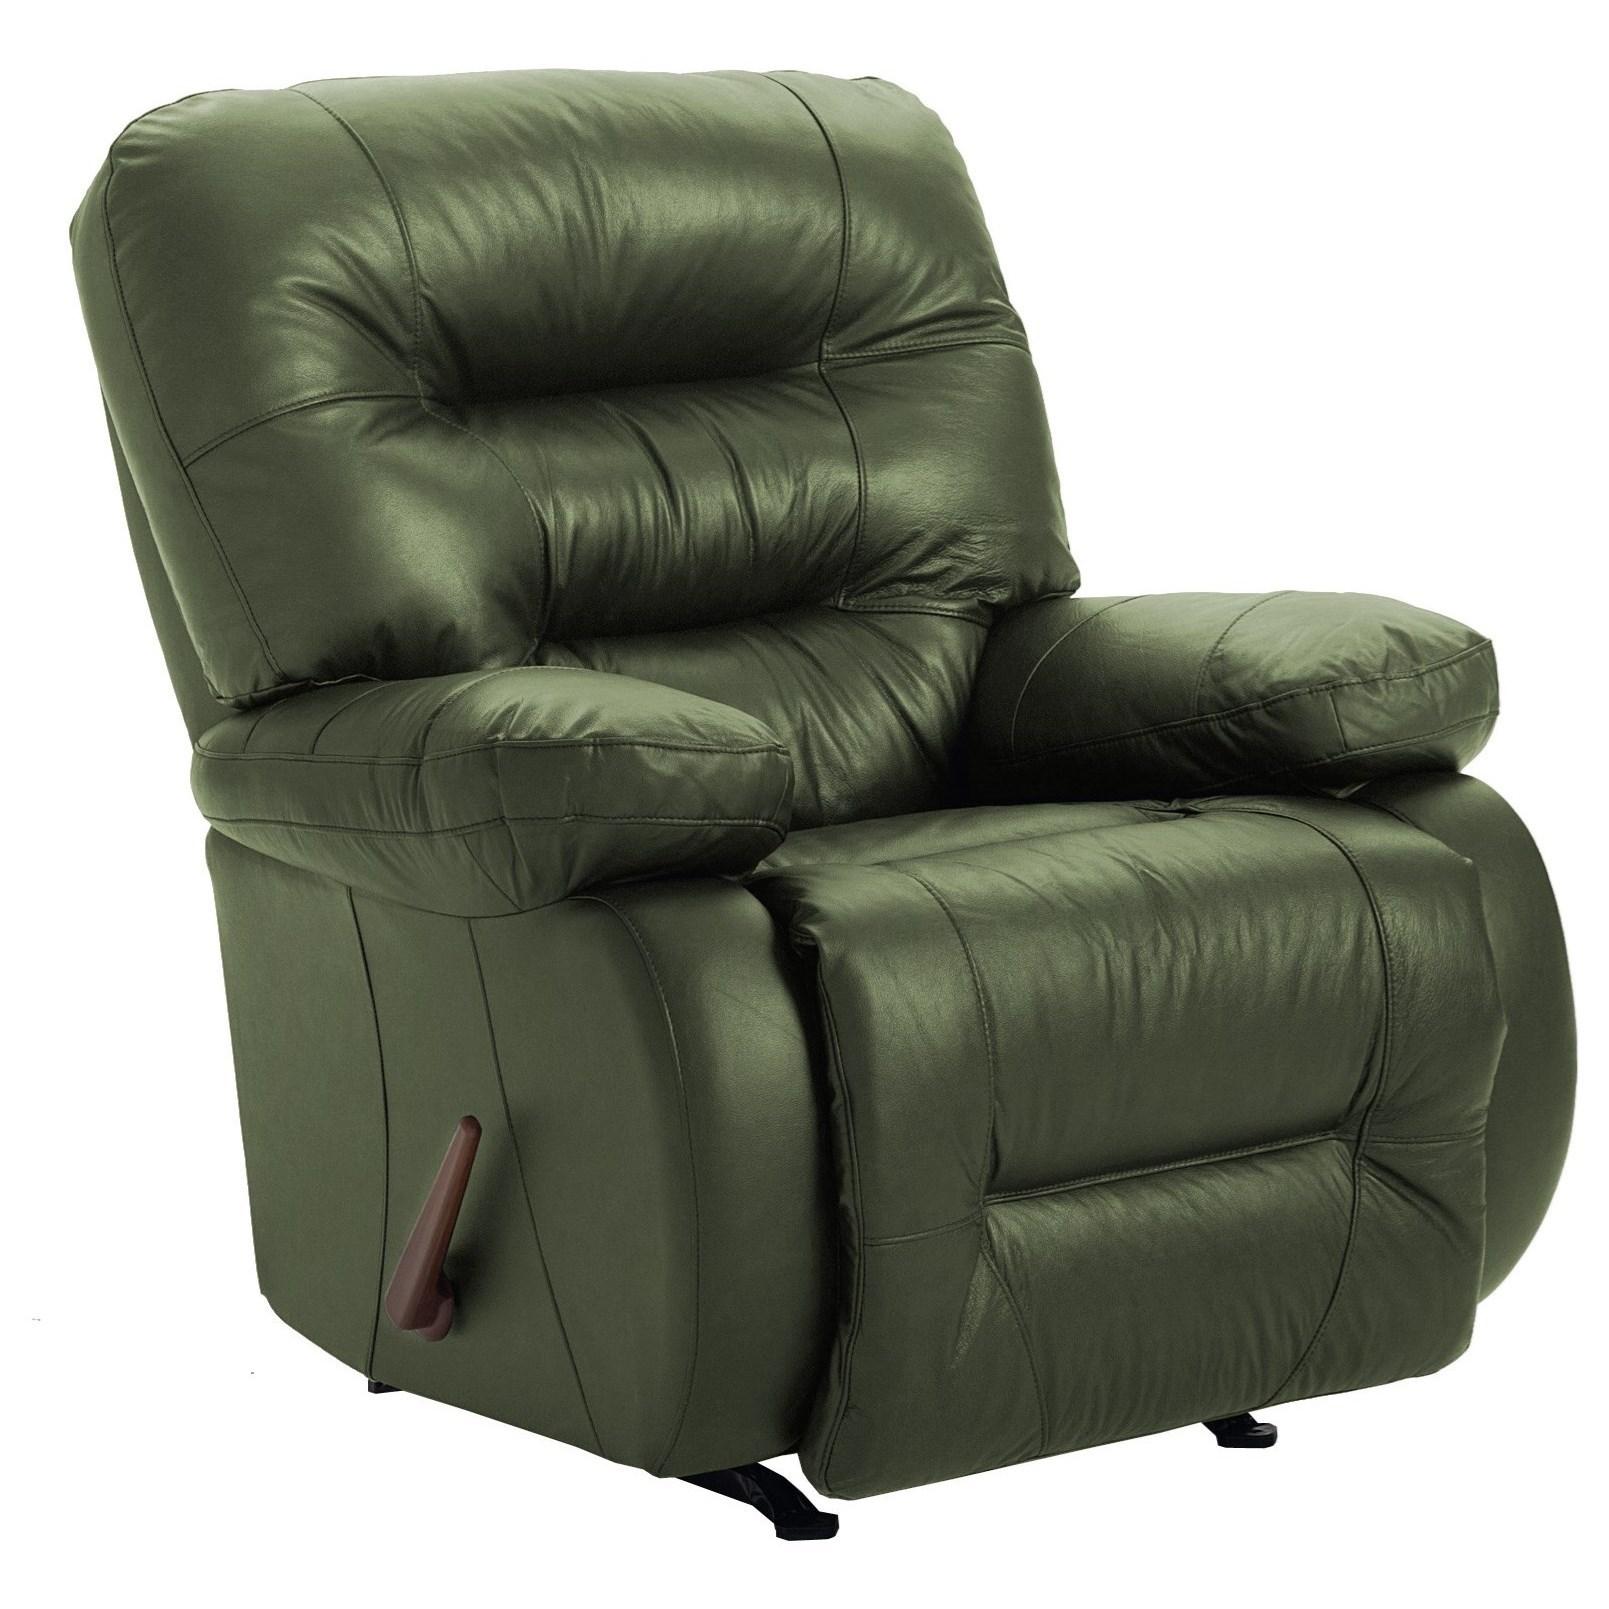 Medium Recliners Maddox Rocker Recliner by Best Home Furnishings at Dunk & Bright Furniture